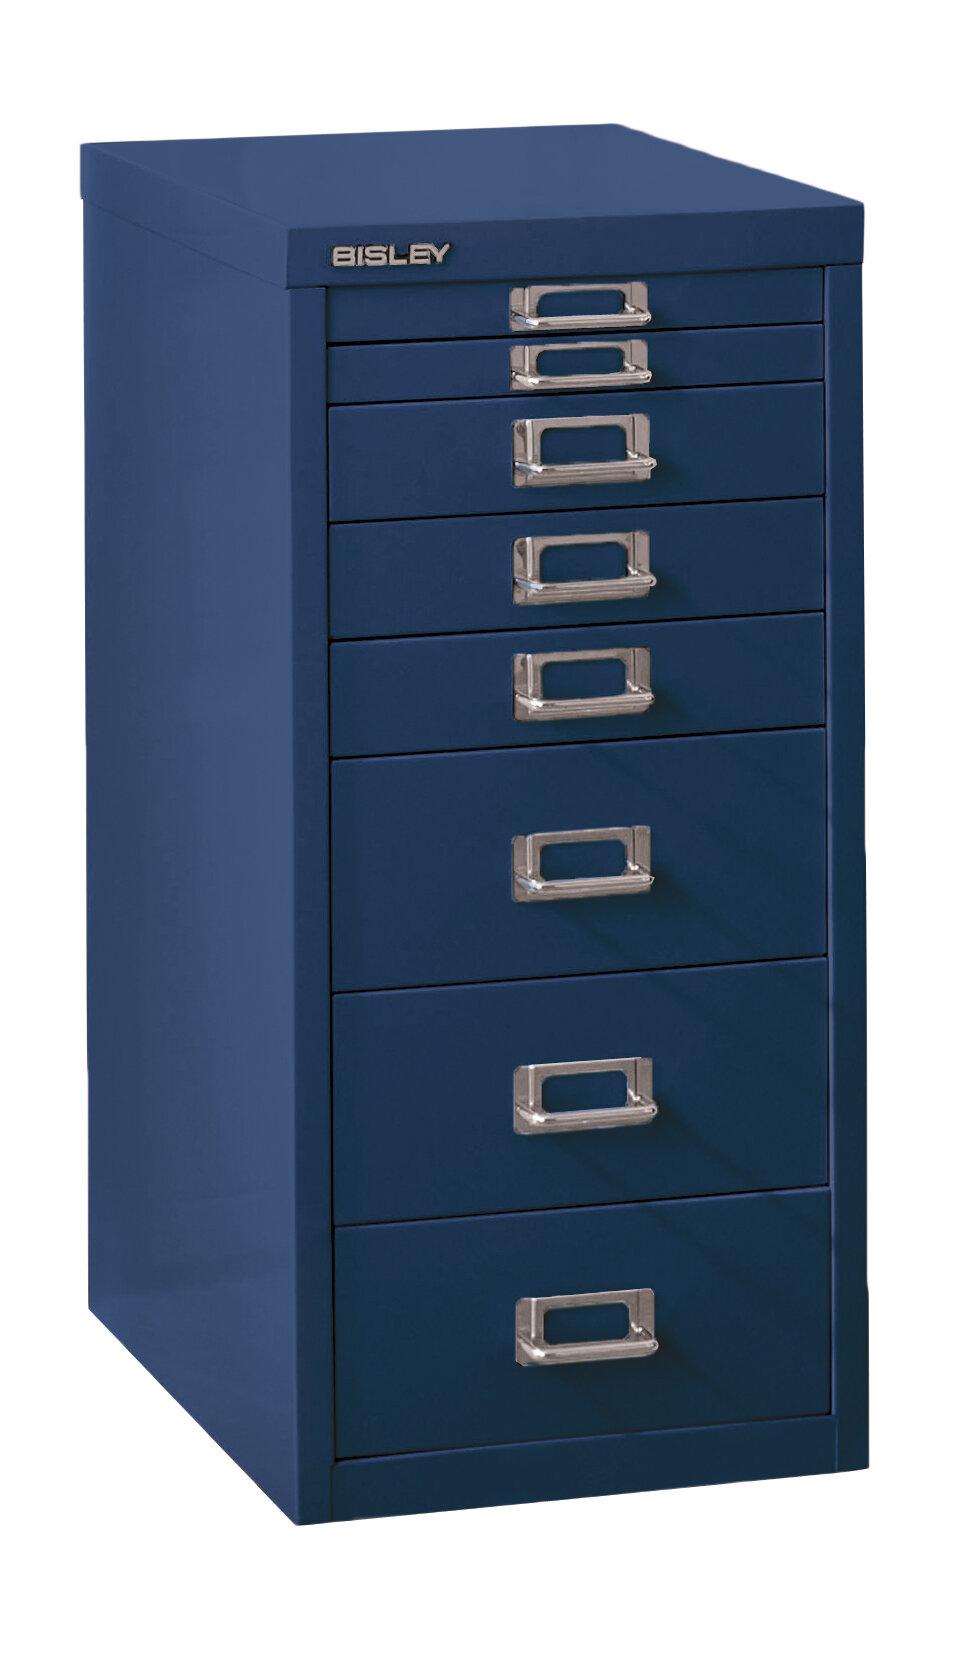 Storage Units SHALLOW 6 DRAWERS A4 DRAWER PAPER STORAGE UNIT ...